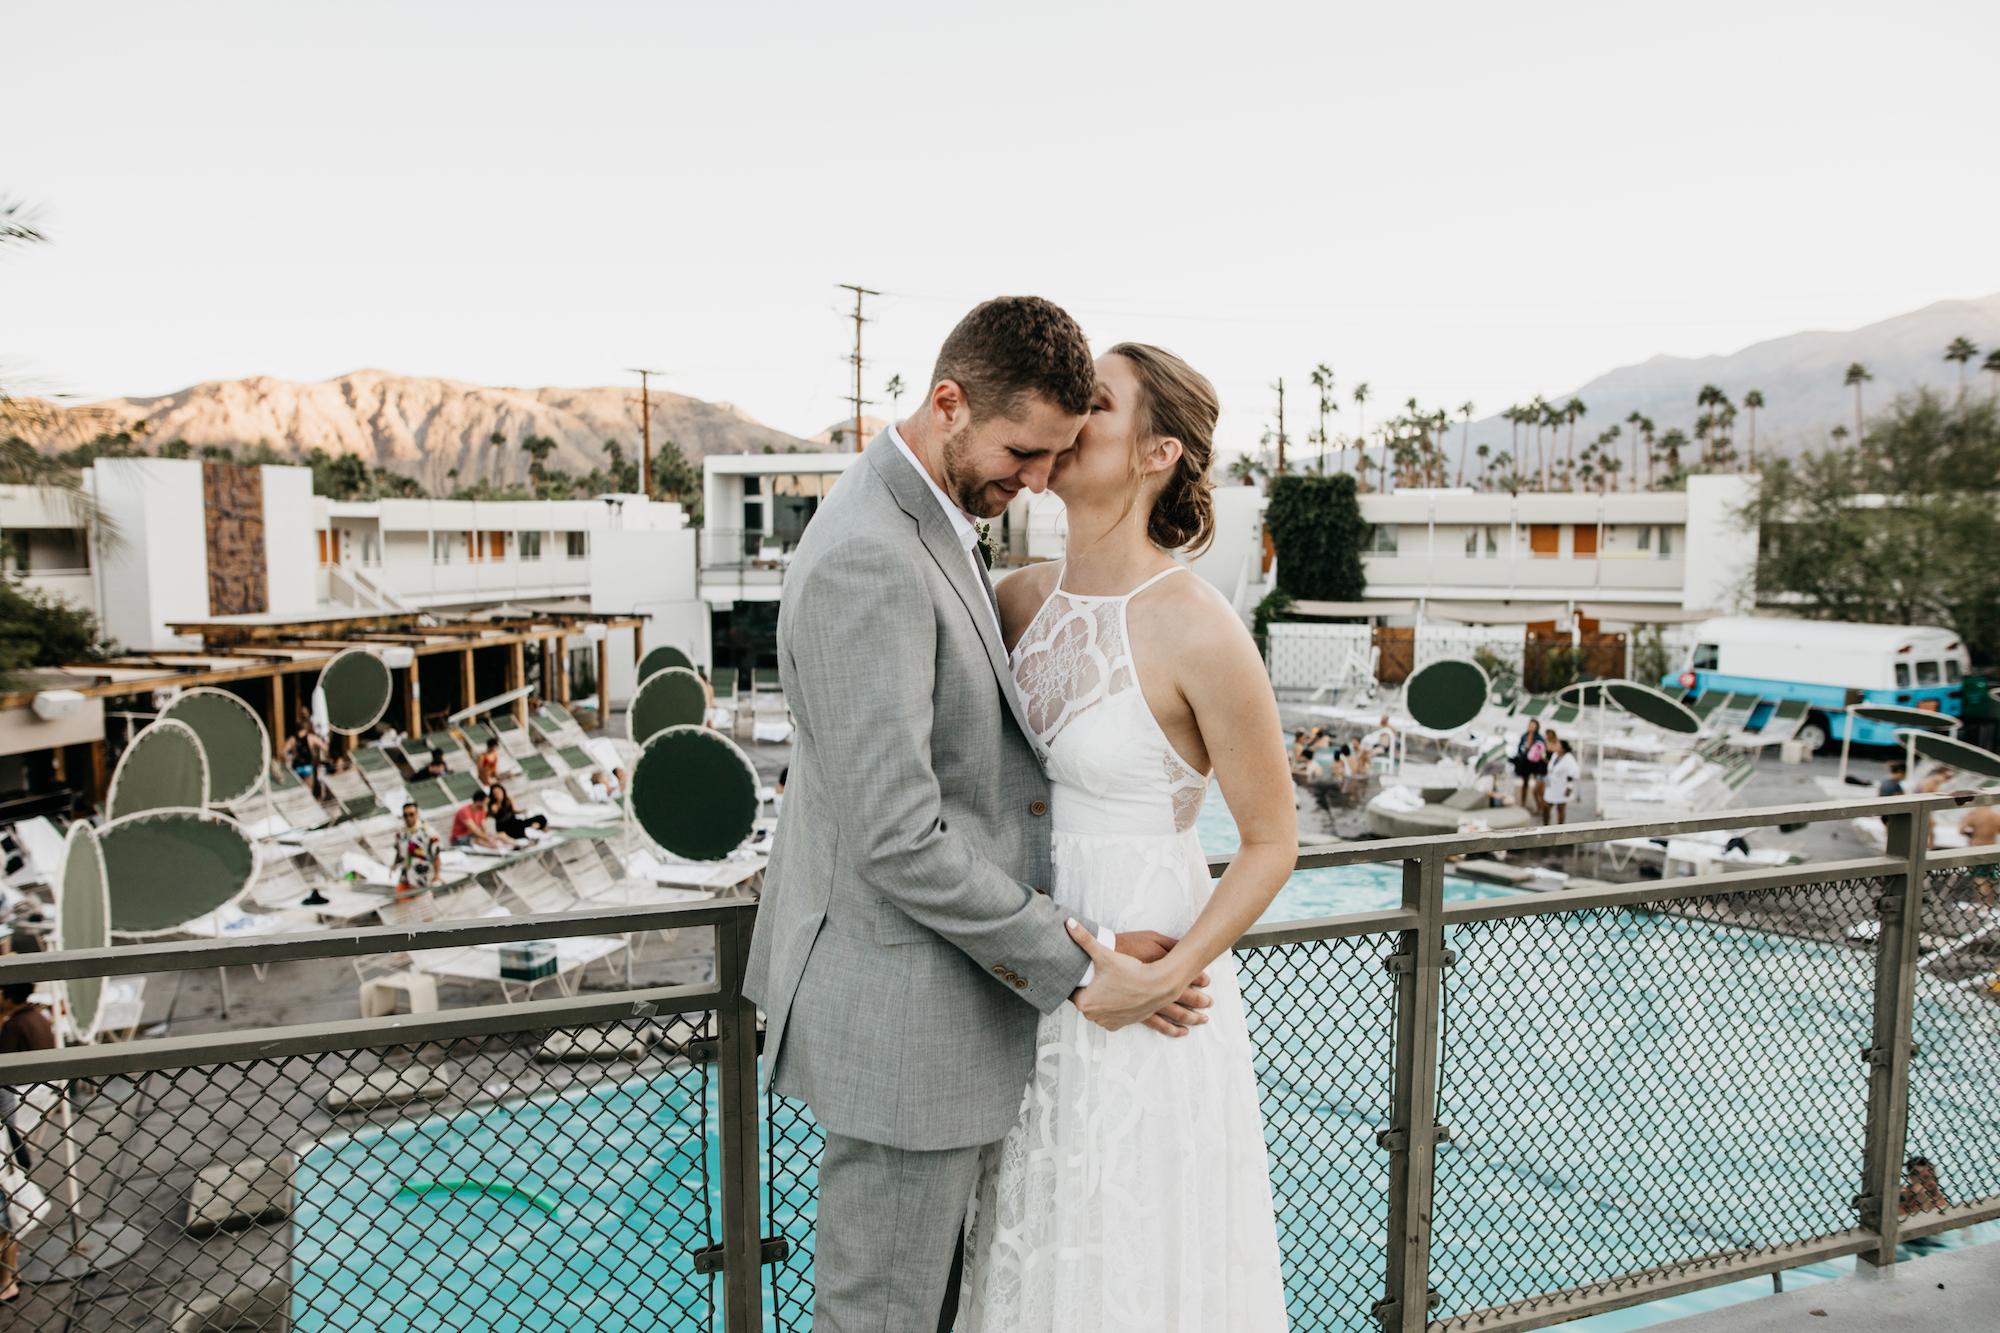 ace-hotel-palm-springs-wedding-photographer653.jpg